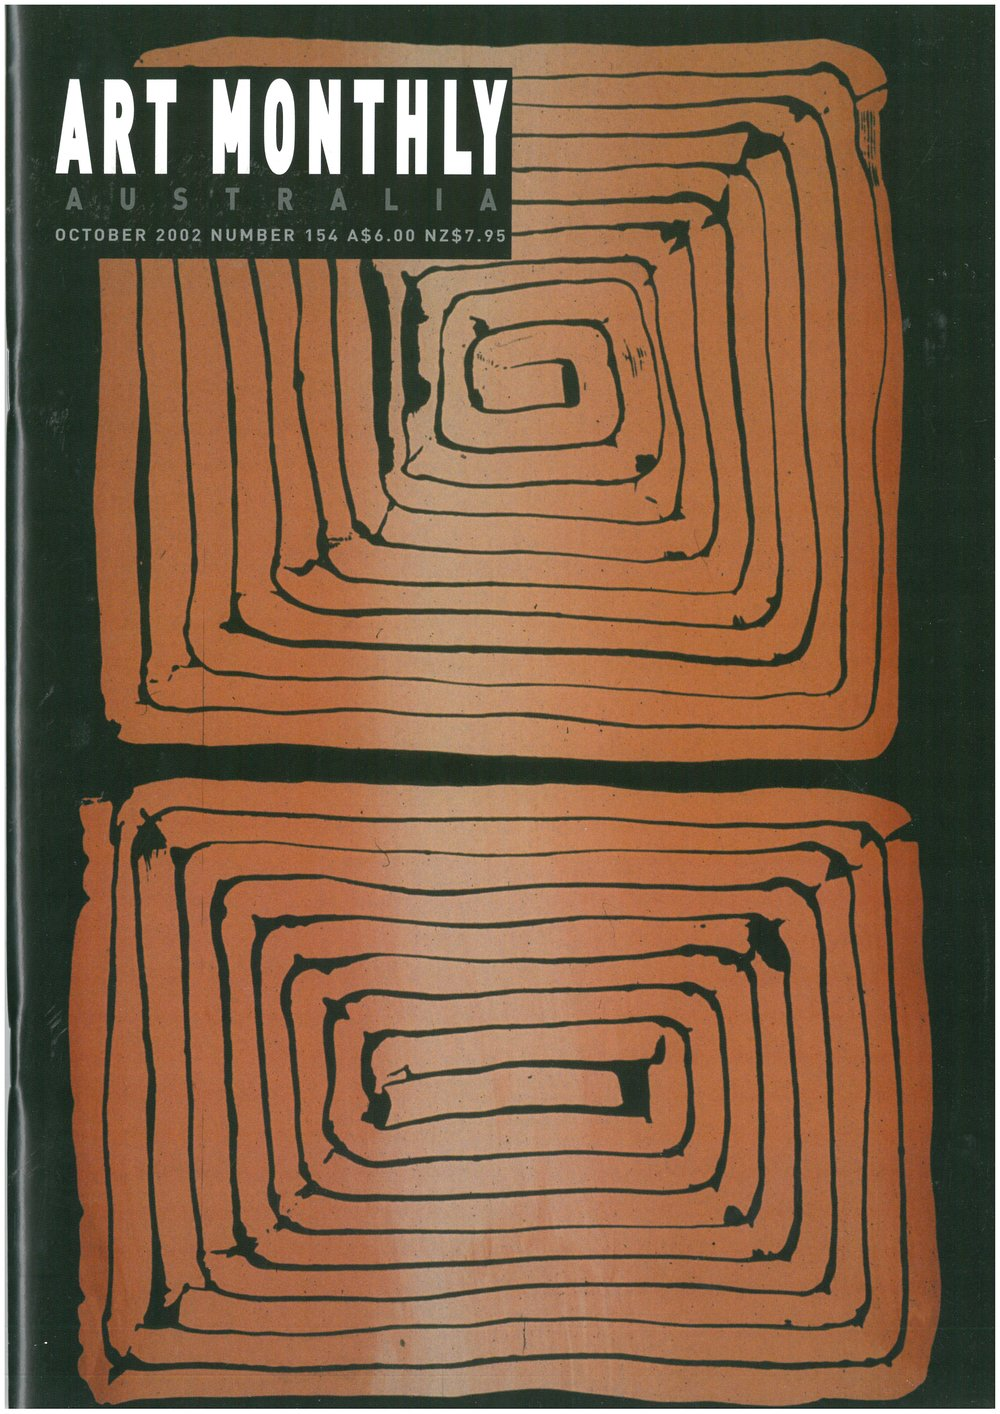 Issue 154 October 2002